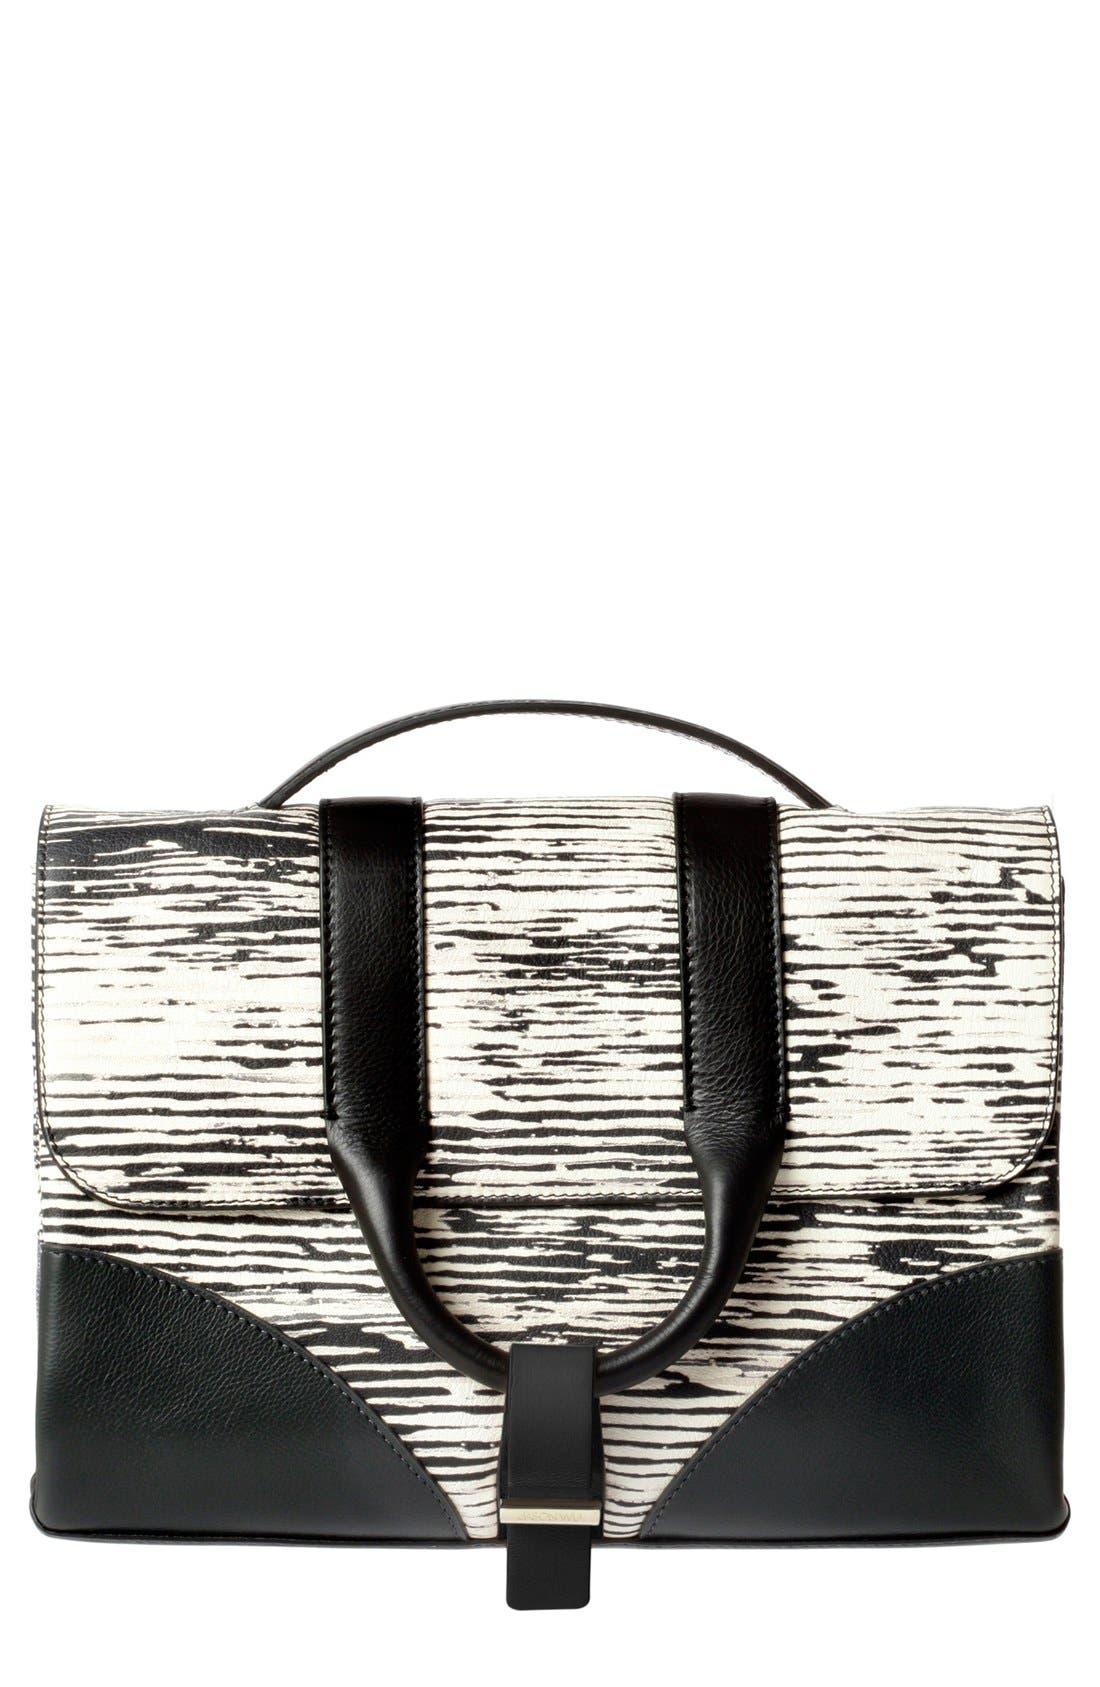 Main Image - Jason Wu 'Hanne' Printed Calfskin Leather Messenger Bag